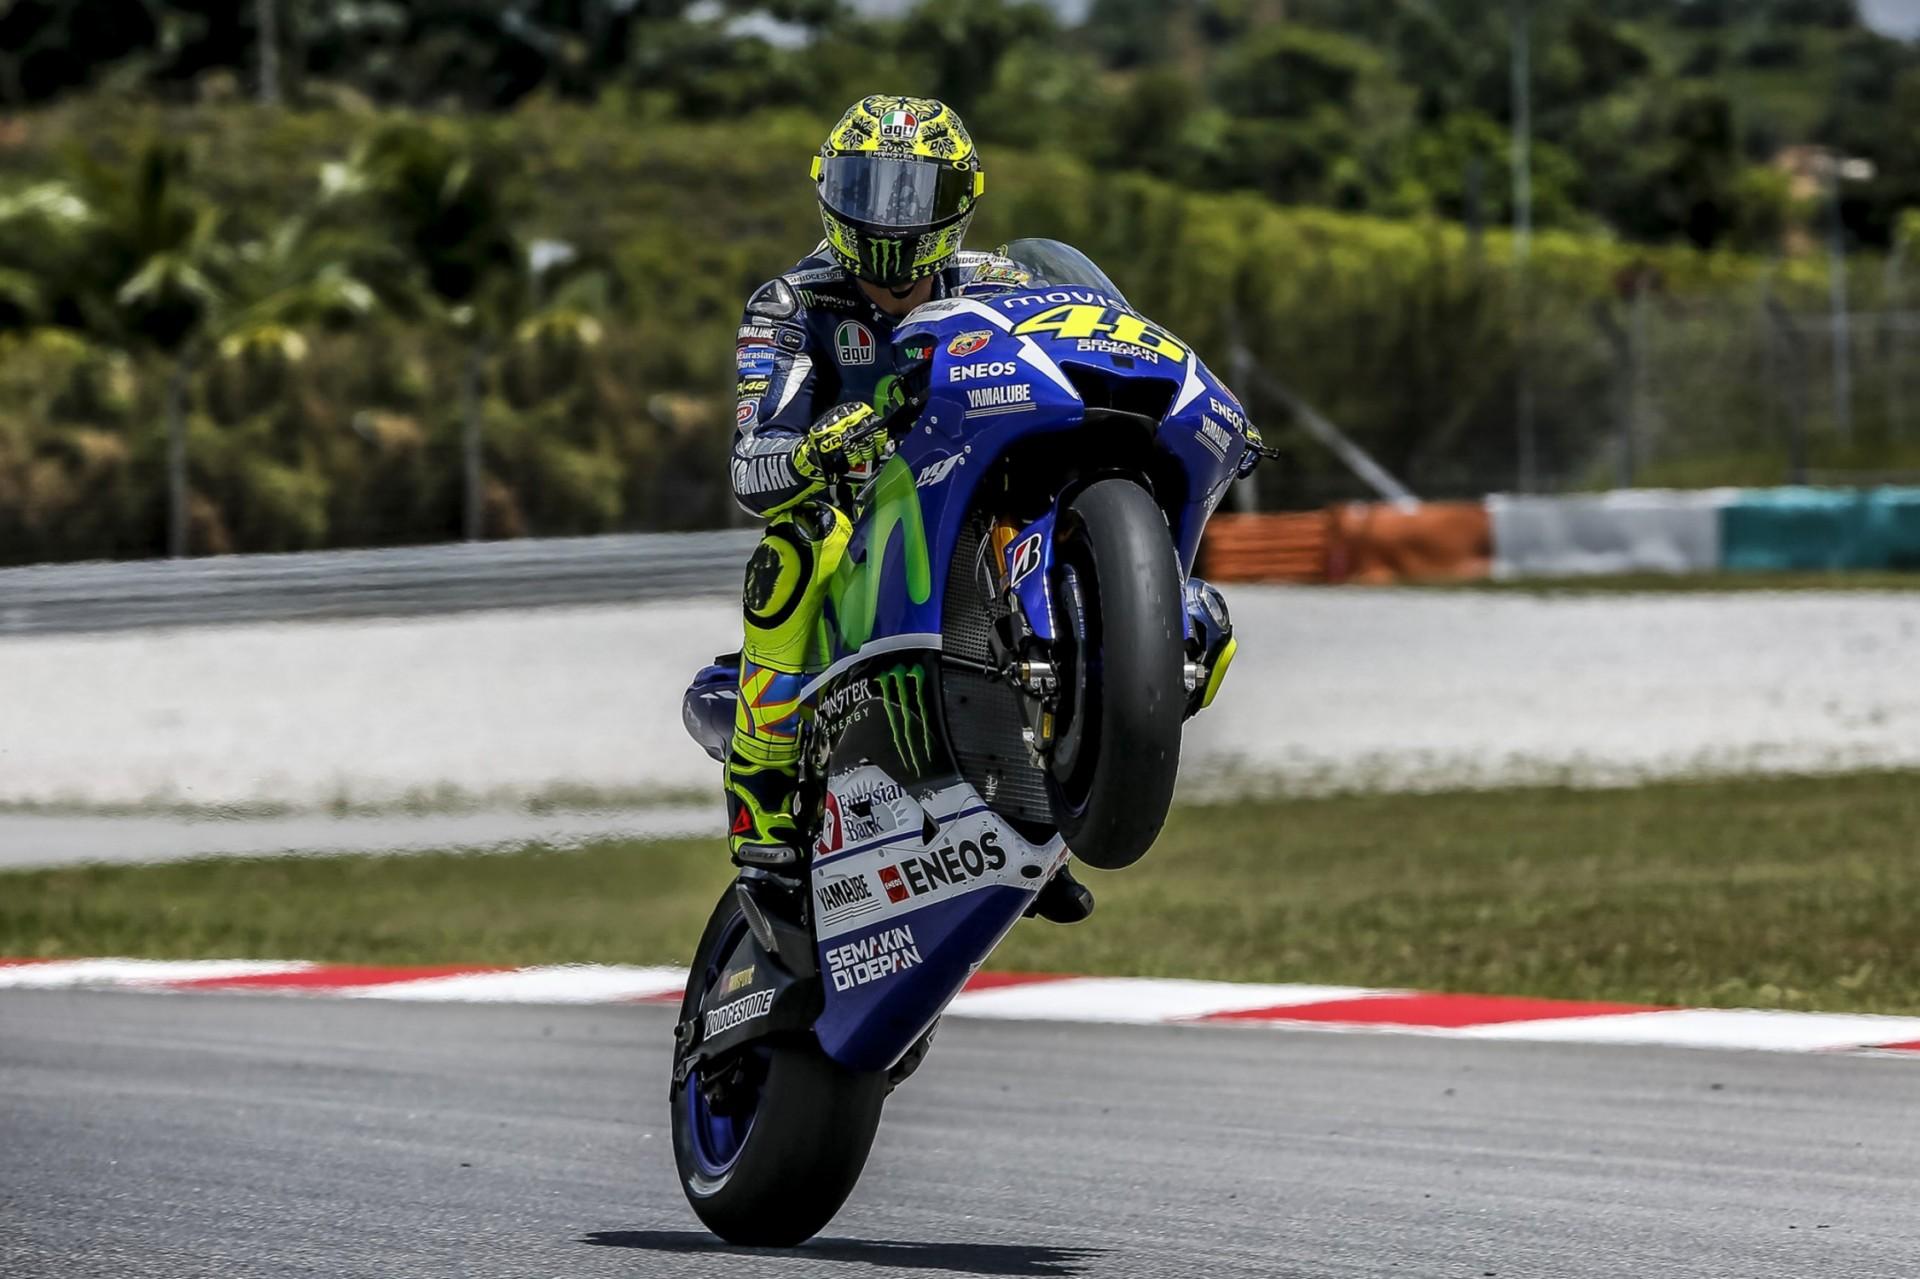 Valentino Rossi: I Want the Title, Linda and a Son - autoevolution